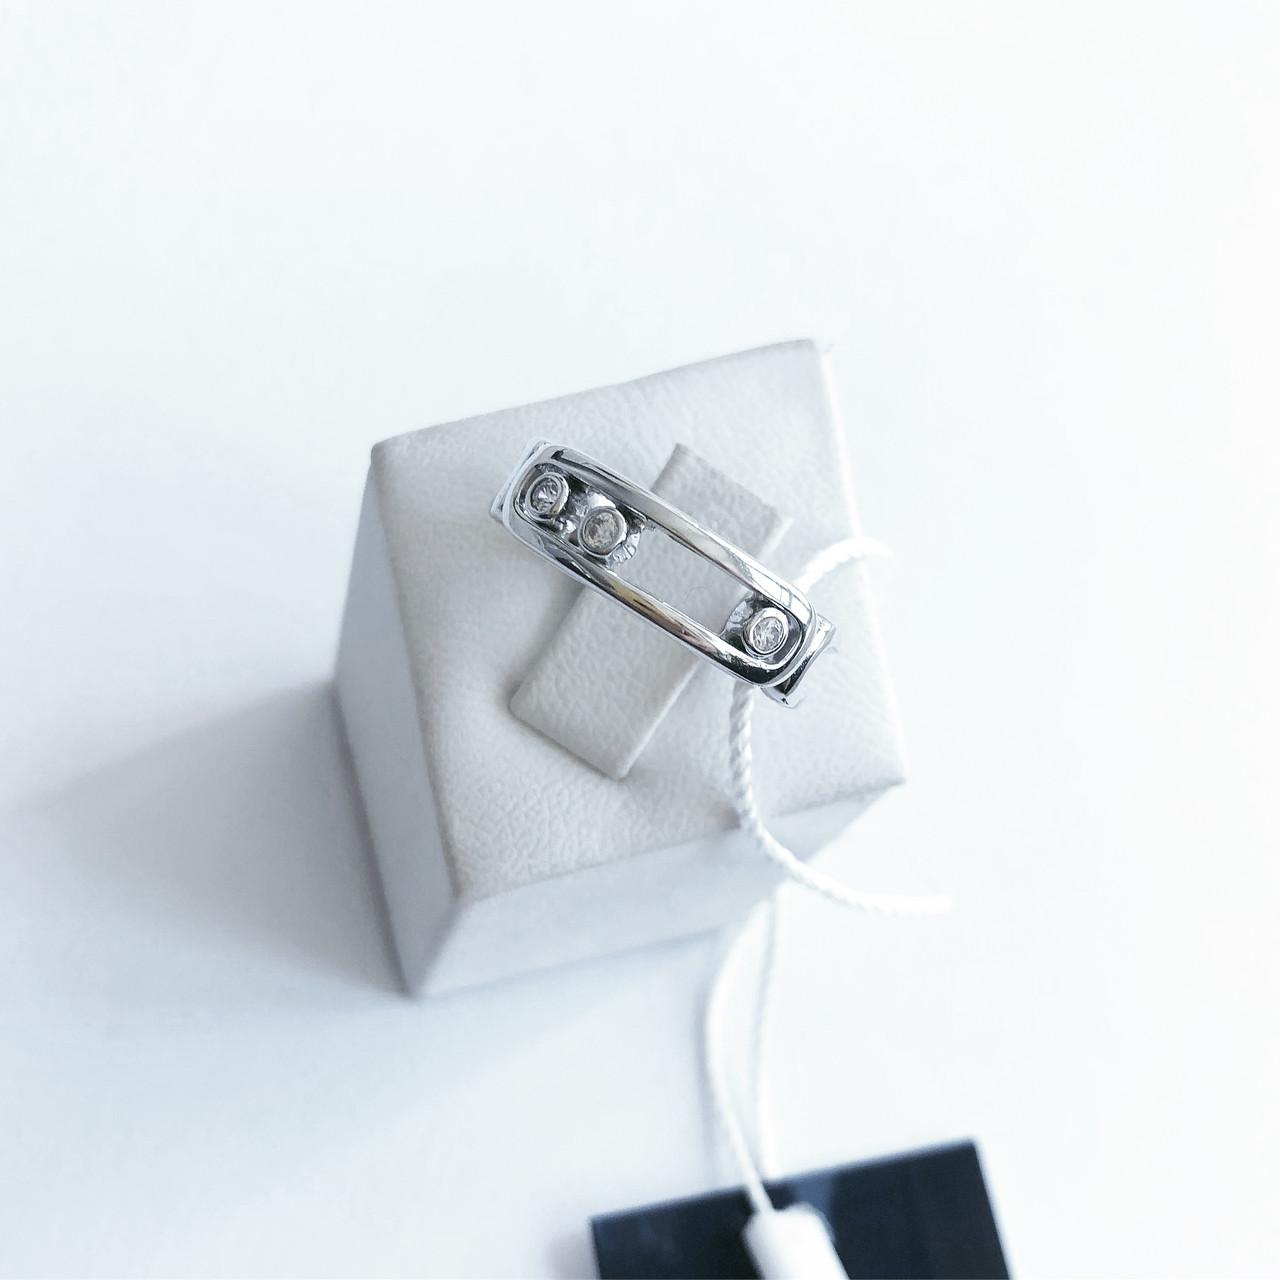 Кольцо из серебра Мої прикраси с подвижными камнями в стиле Messika (размер 17,5)